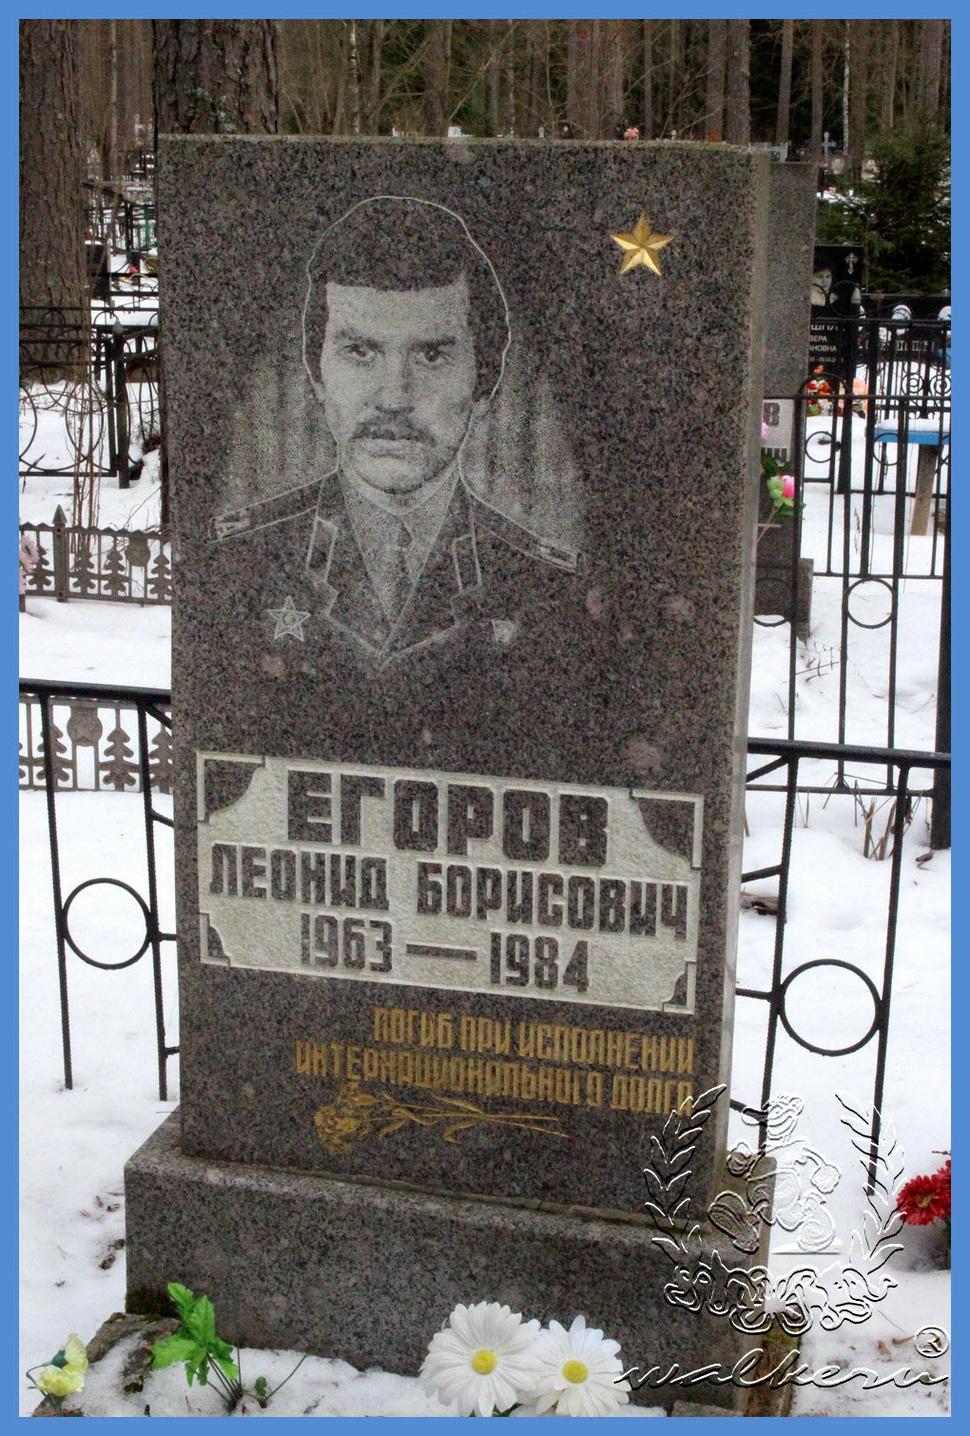 Егоров Леонид Борисович